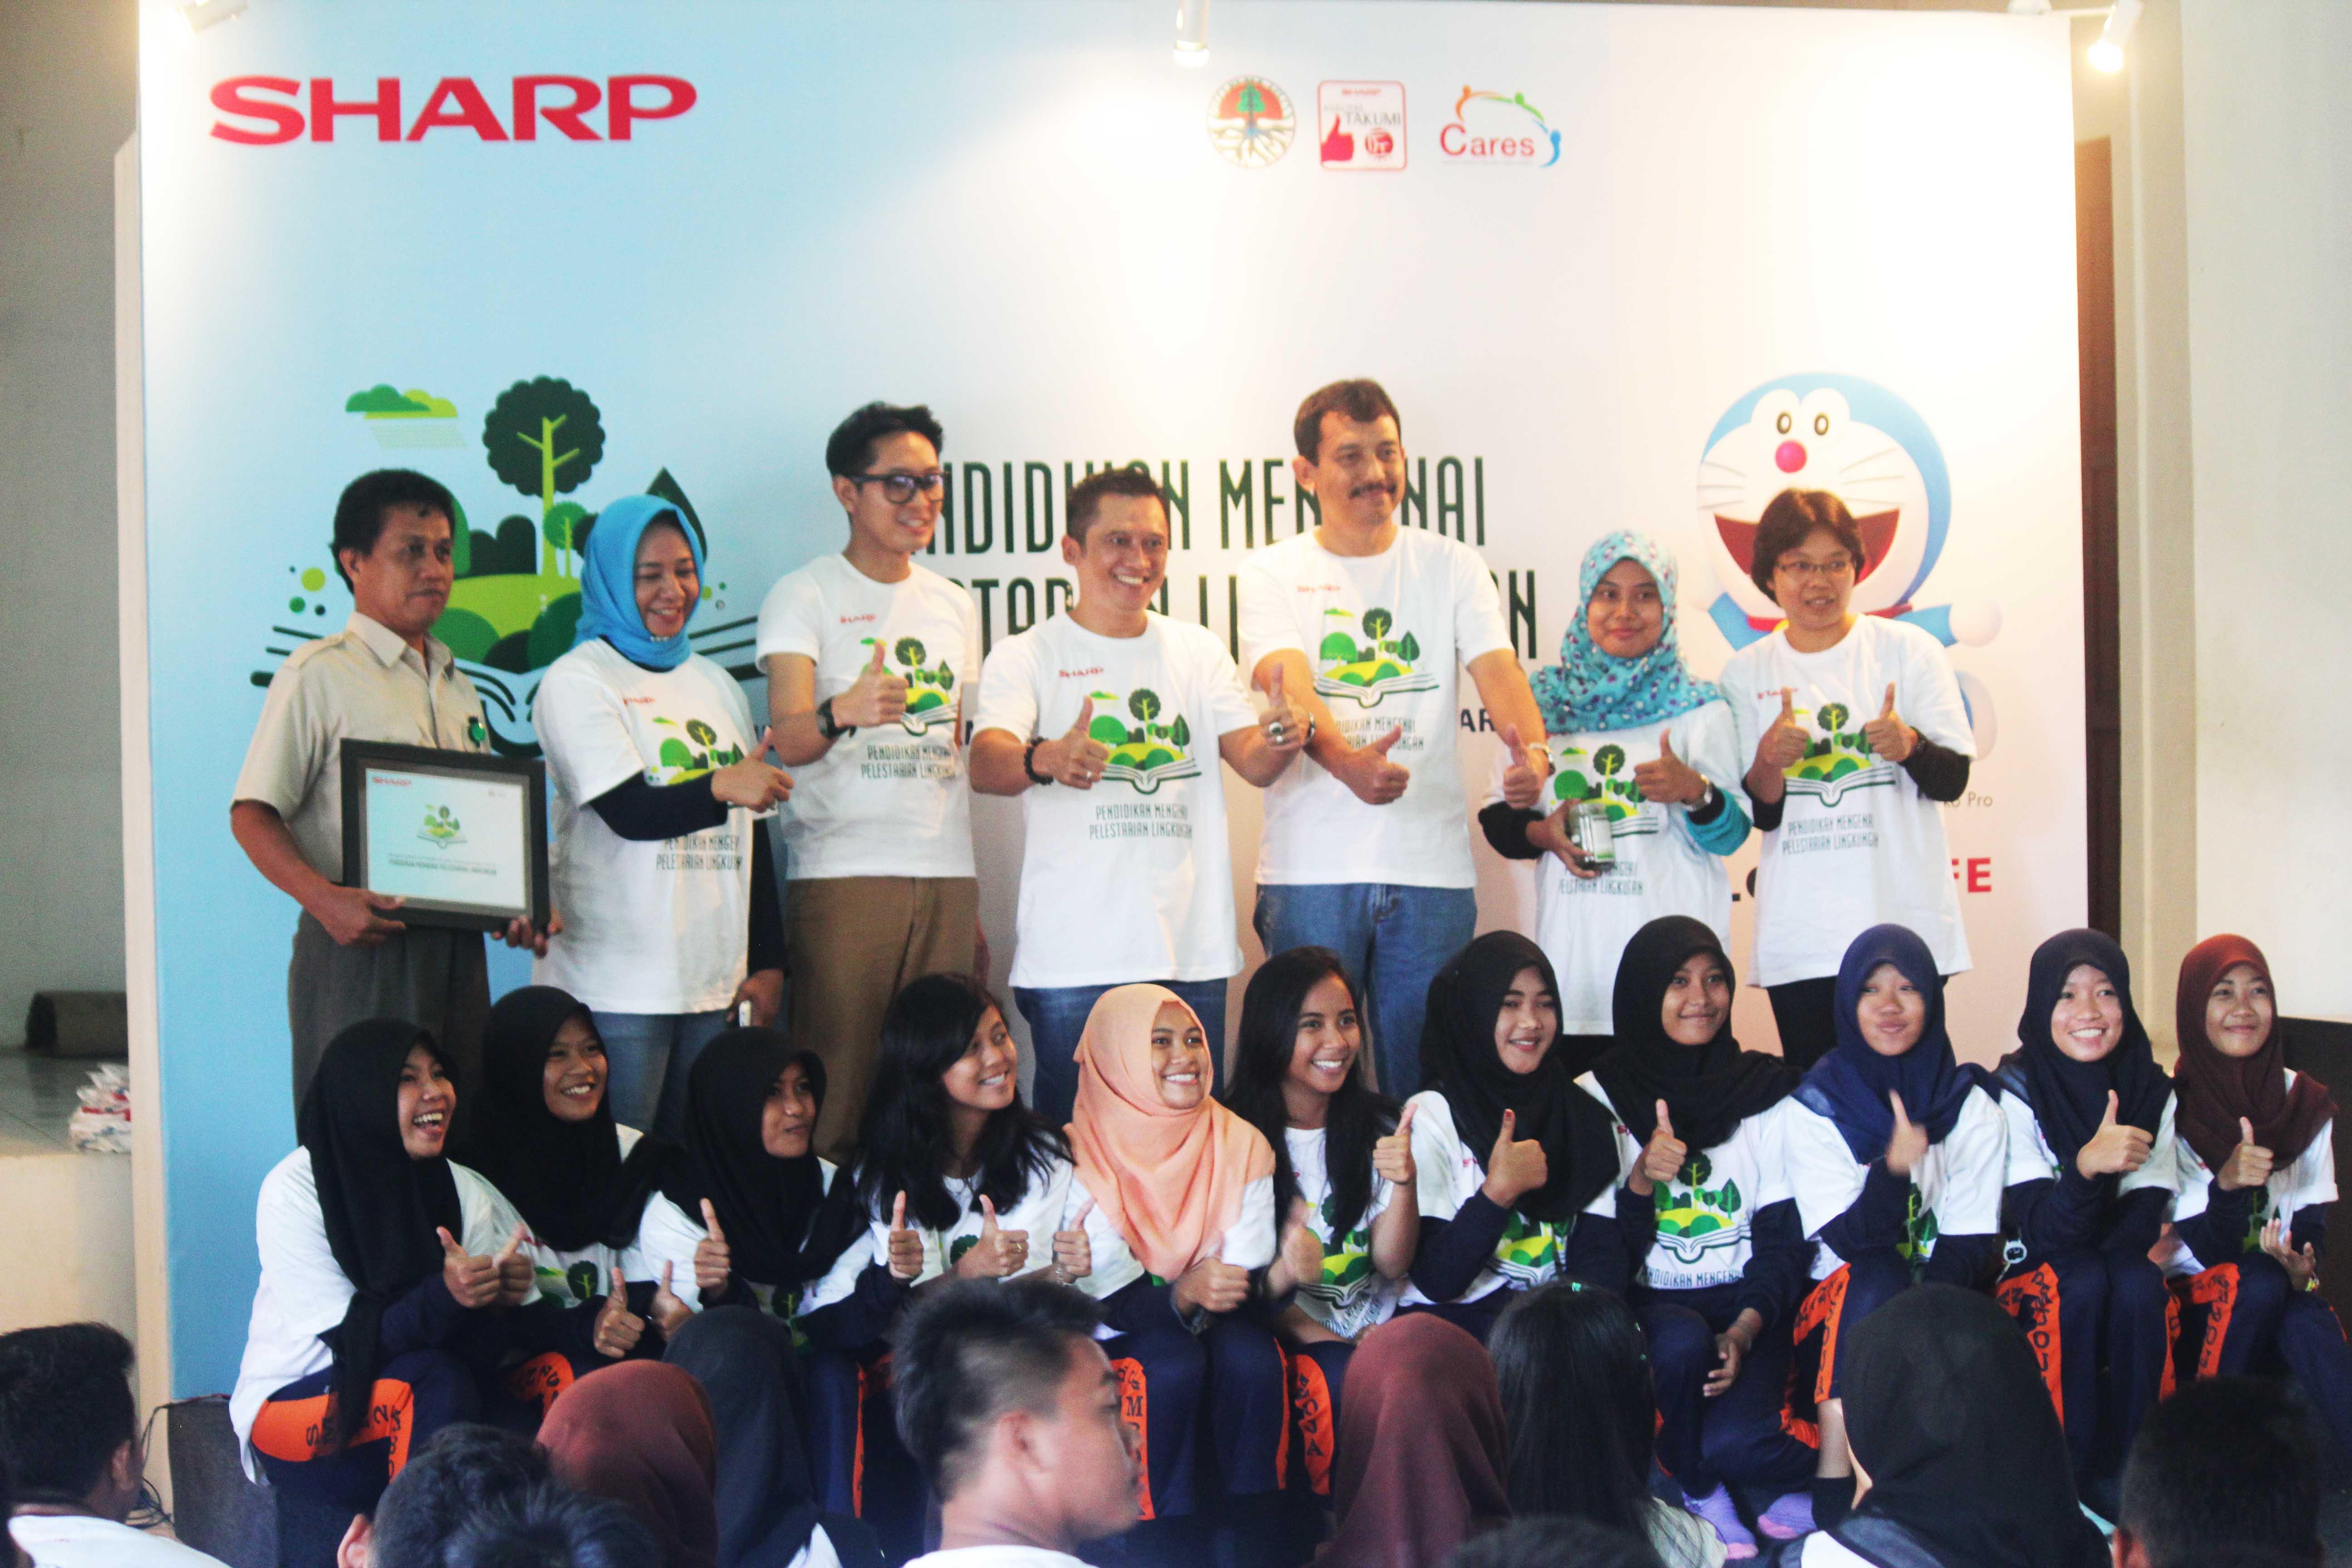 """Pendidikan Pelestarian Lingkungan untuk Pelajar"" Kerjasama PT Sharp dan Balitek KSDA"